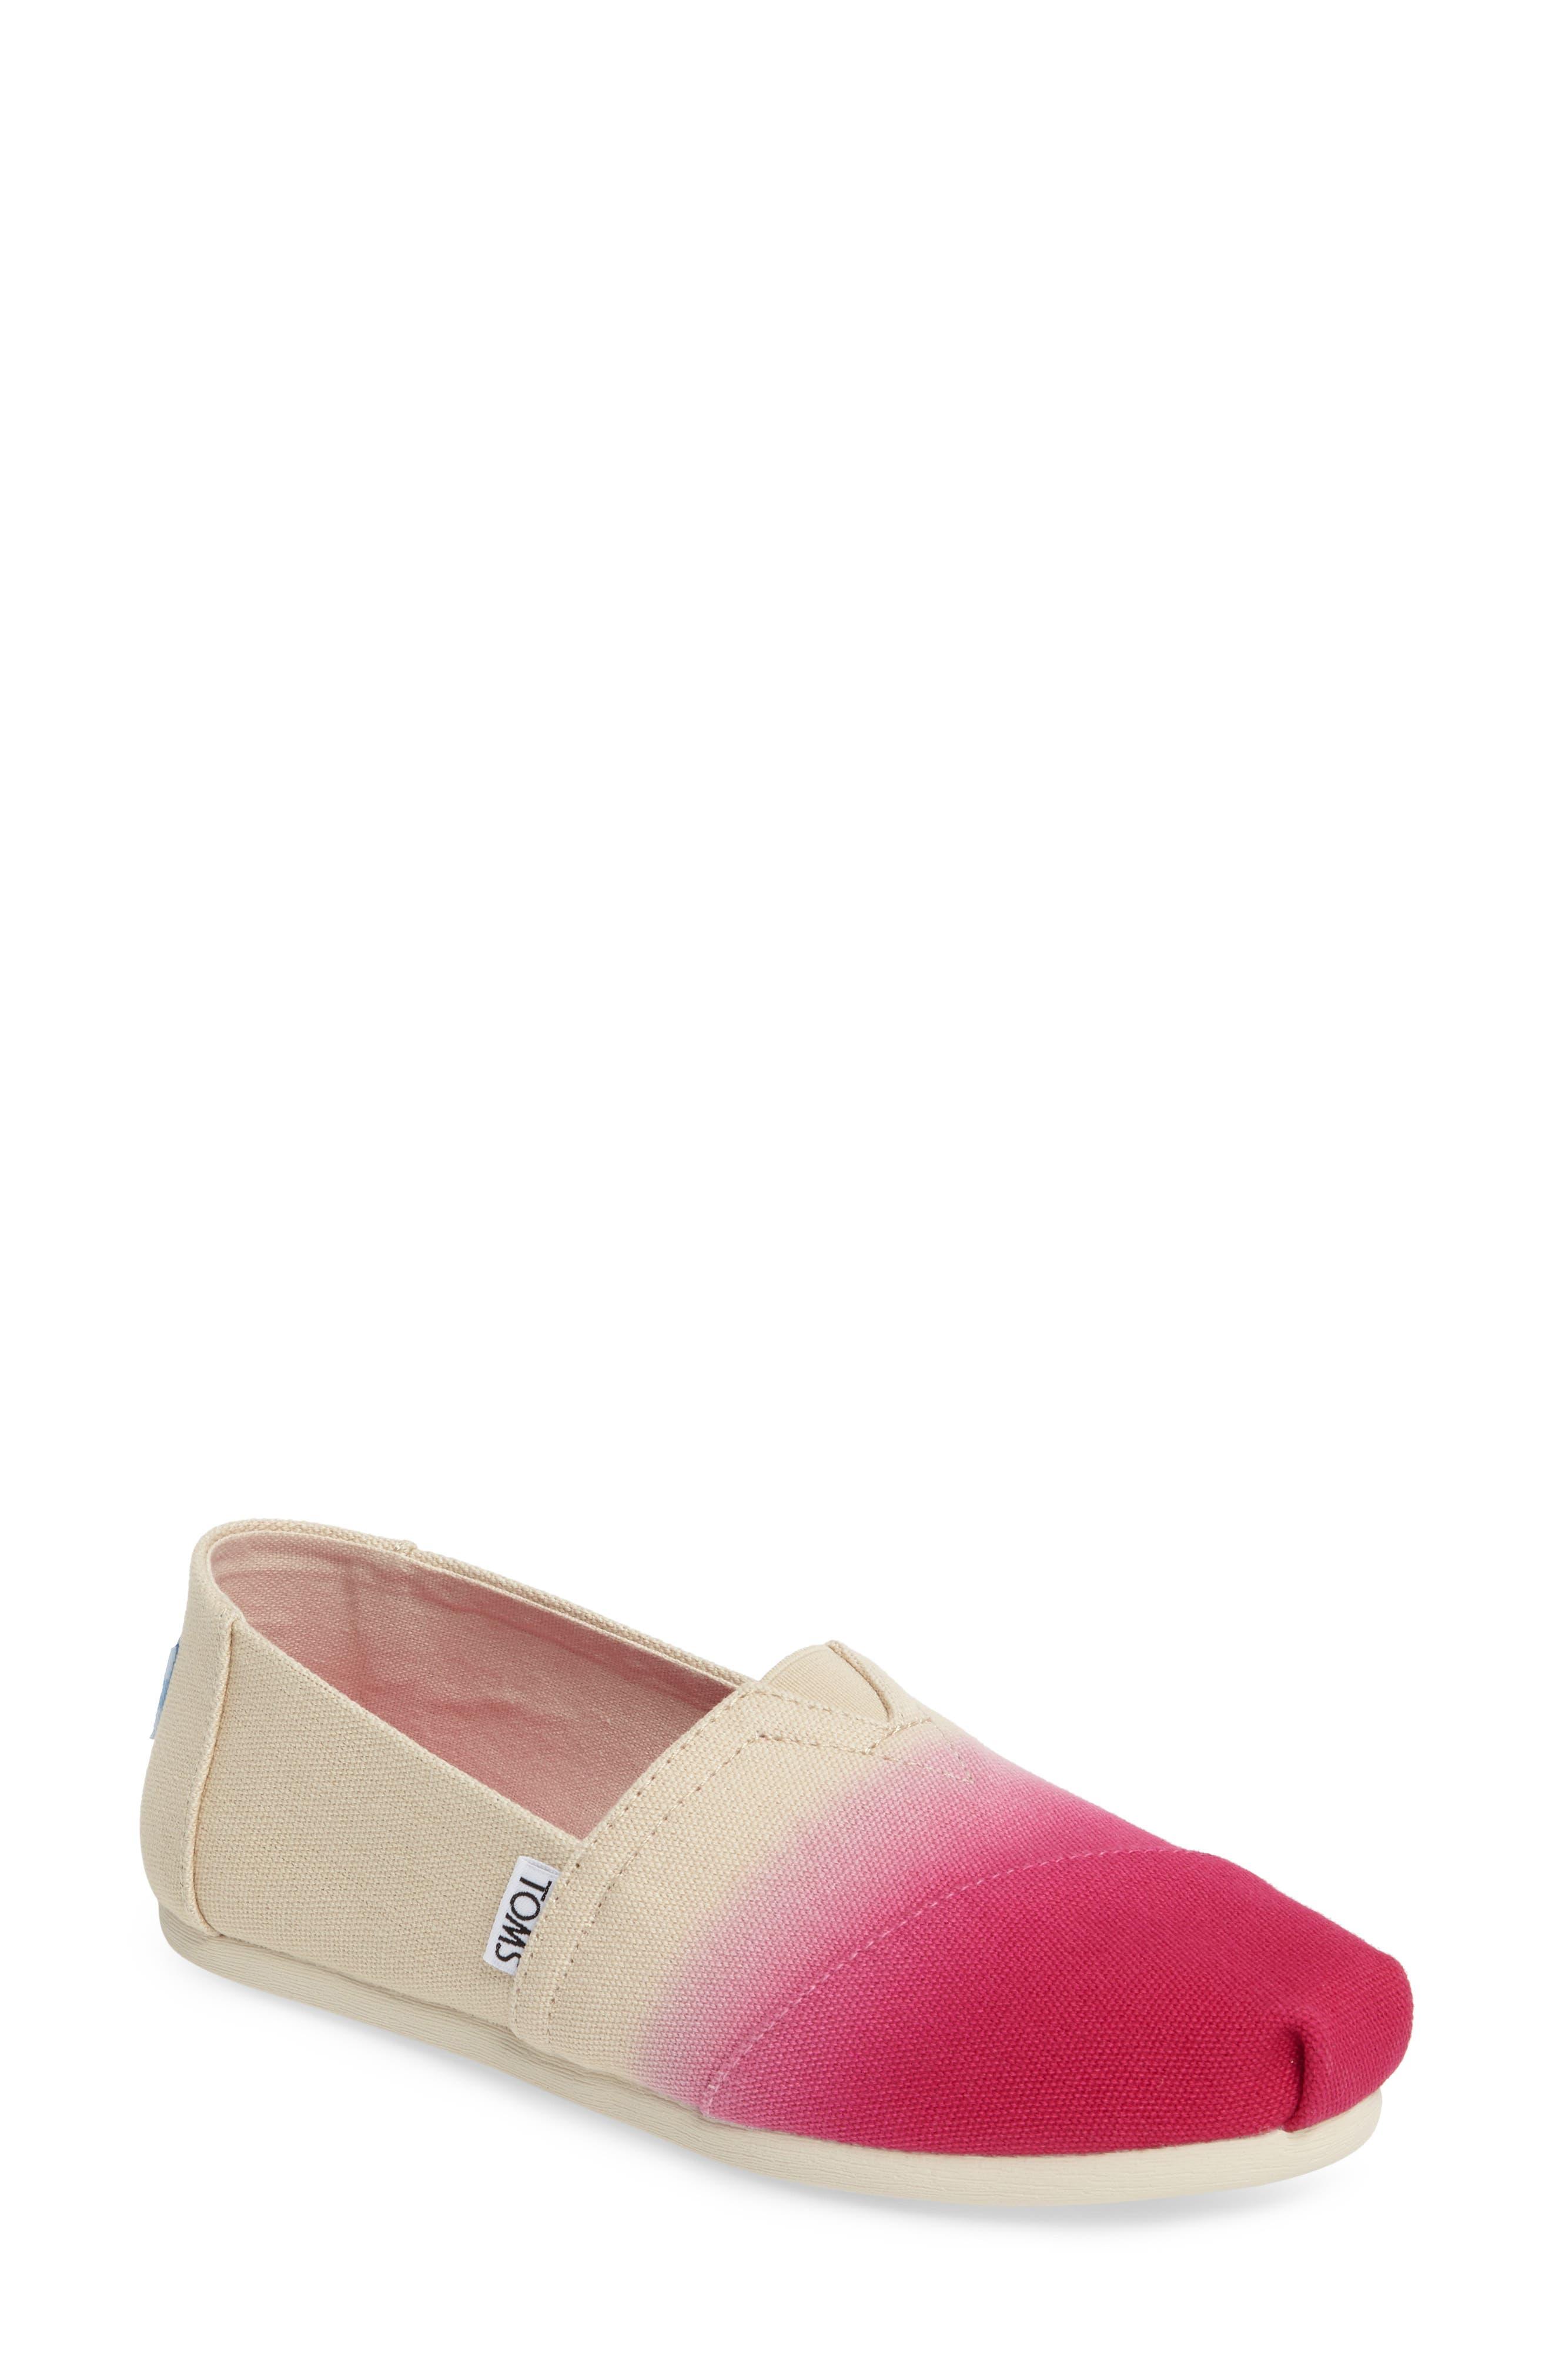 TOMS Dip-Dyed Alpargata Slip-On (Women)